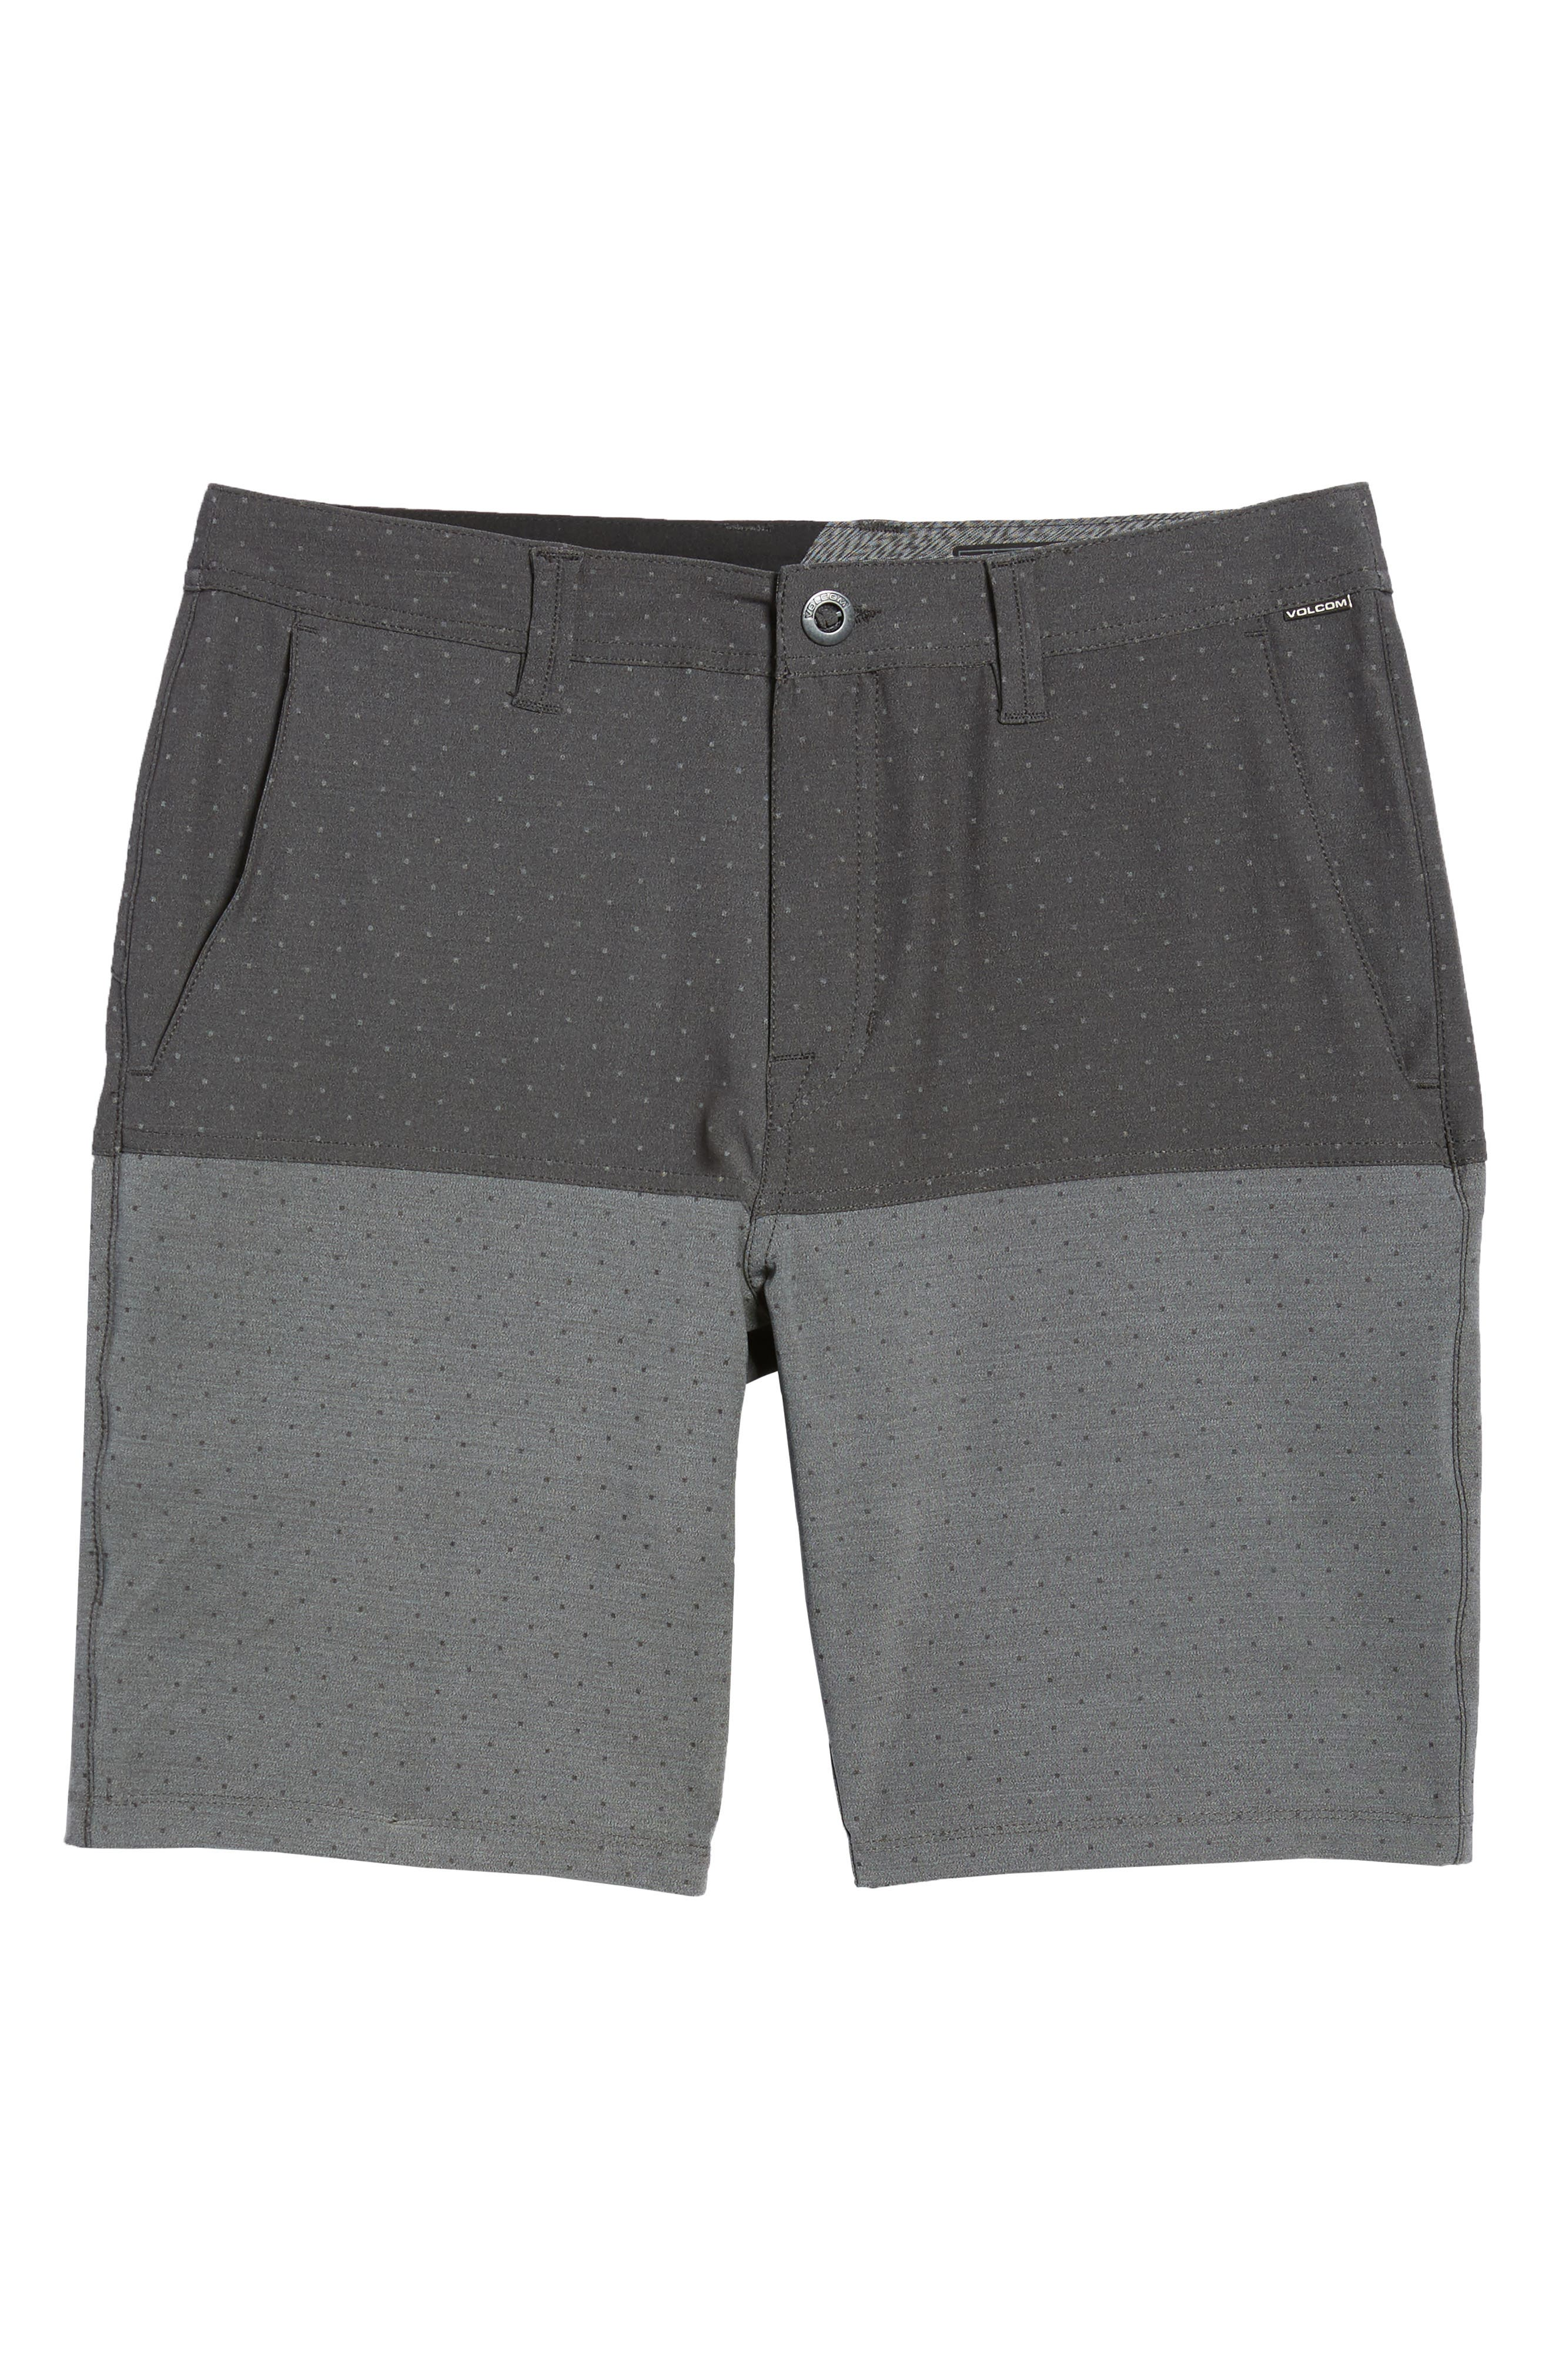 Surf N' Turf Block Hybrid Shorts,                             Alternate thumbnail 6, color,                             001